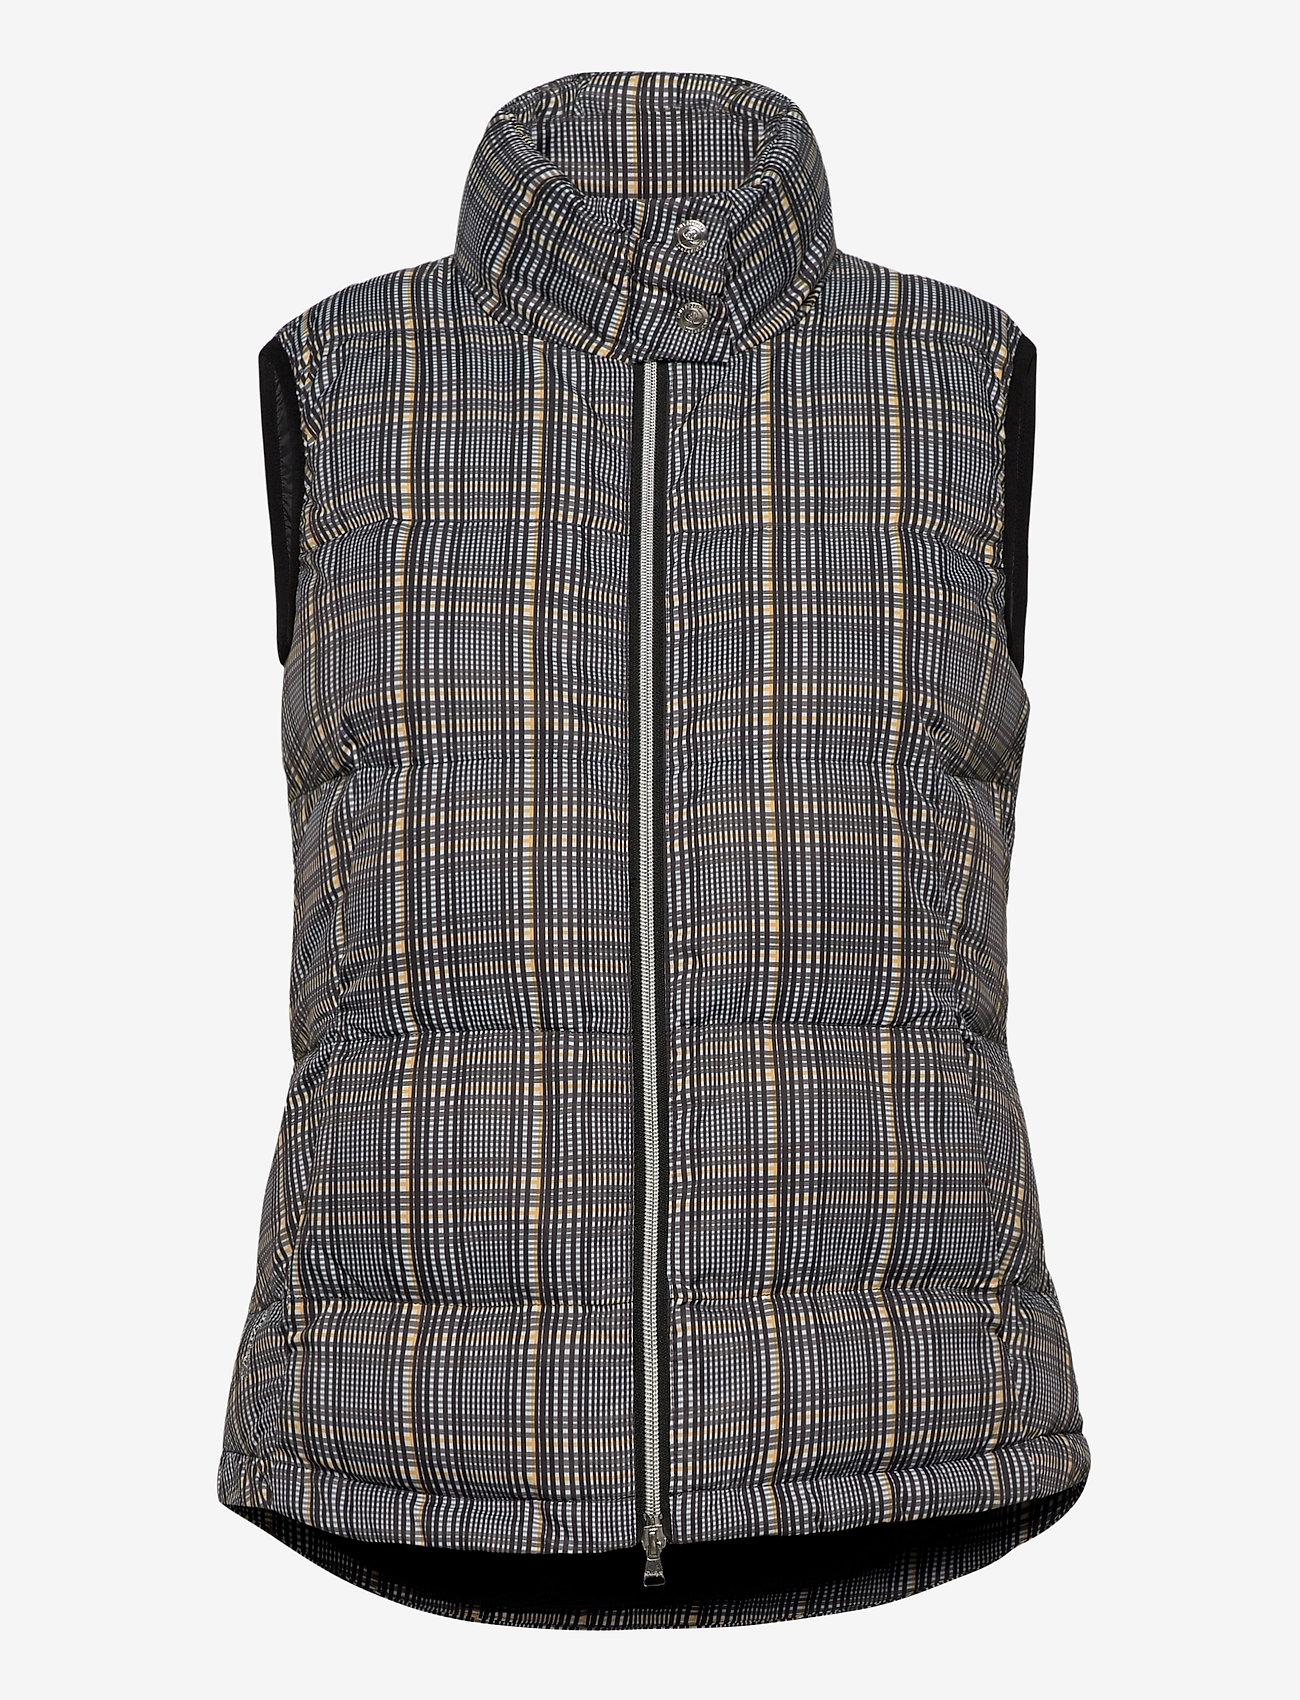 Daily Sports - EDYTH PADDED VEST - puffer vests - black - 1